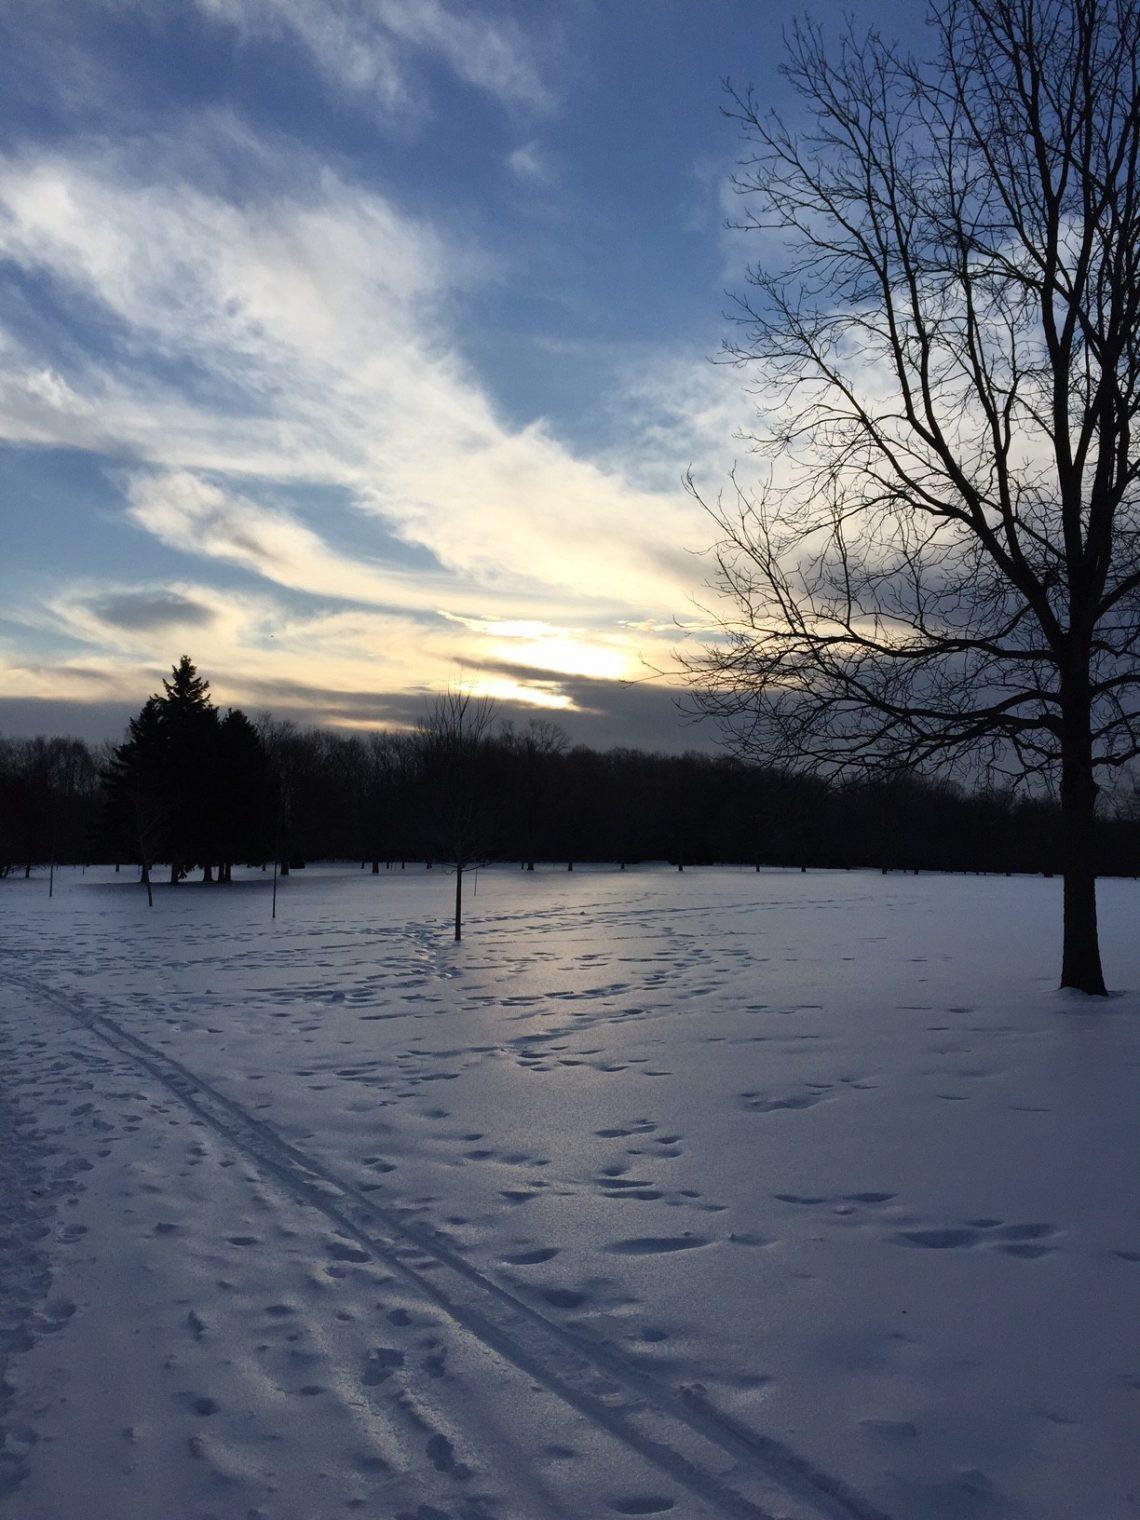 Sunnybrook park upper field